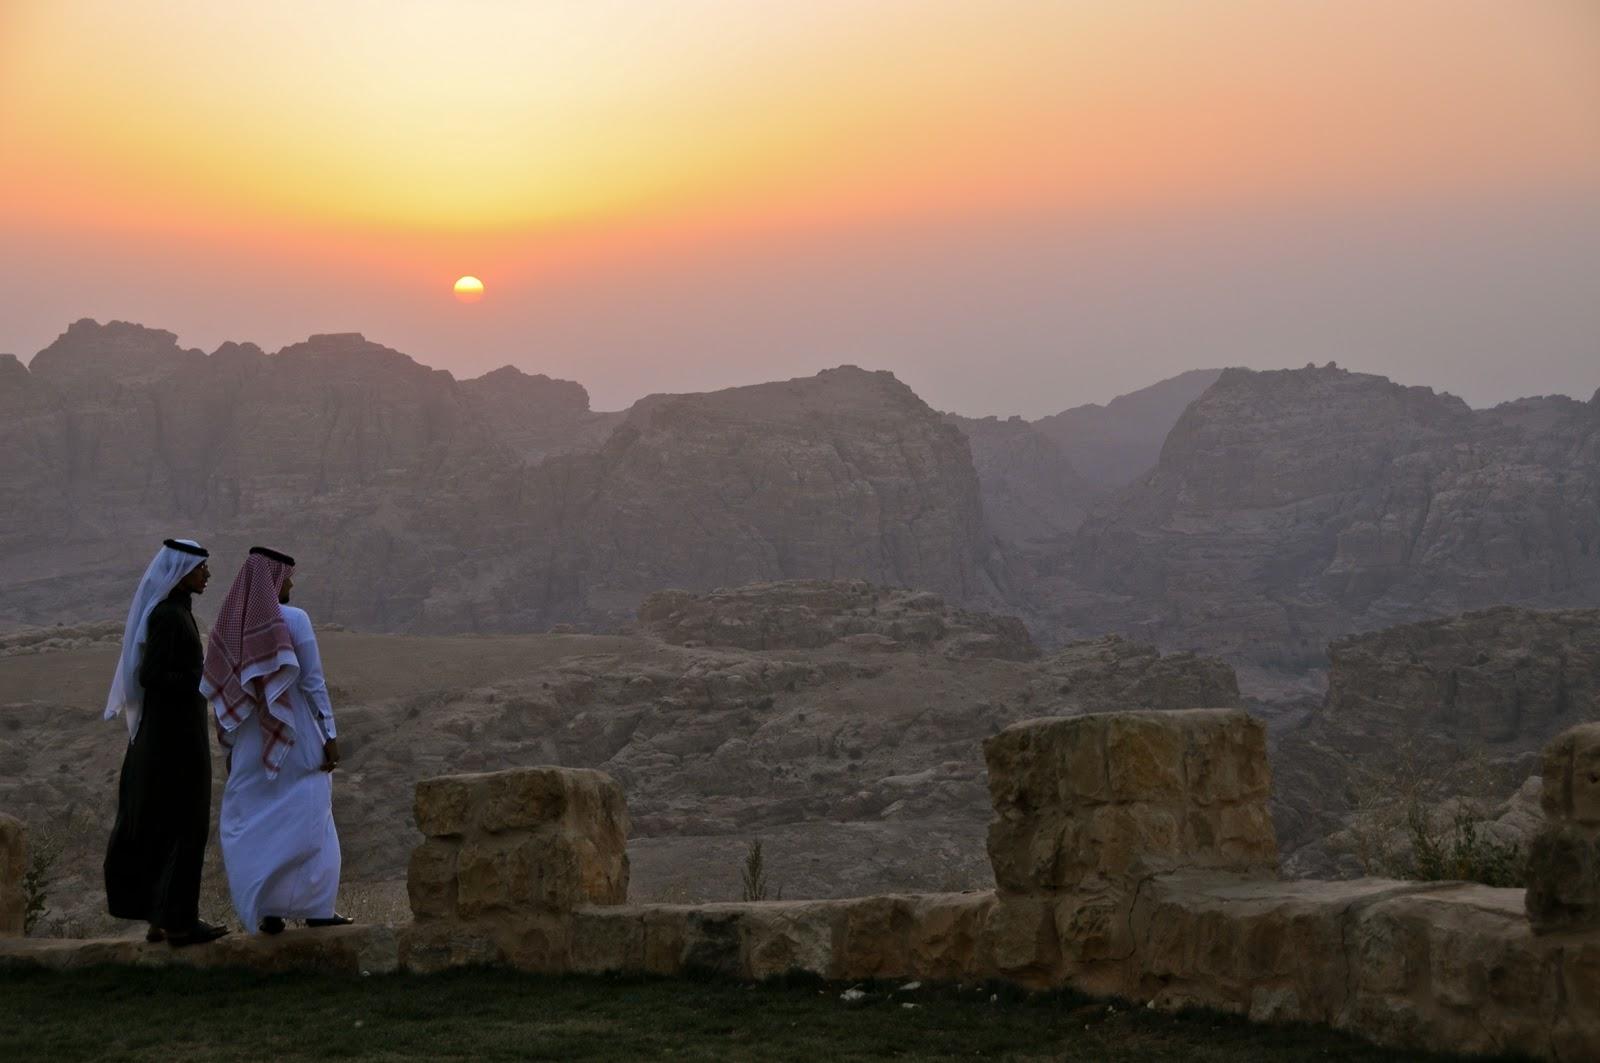 site de rencontre en jordanie